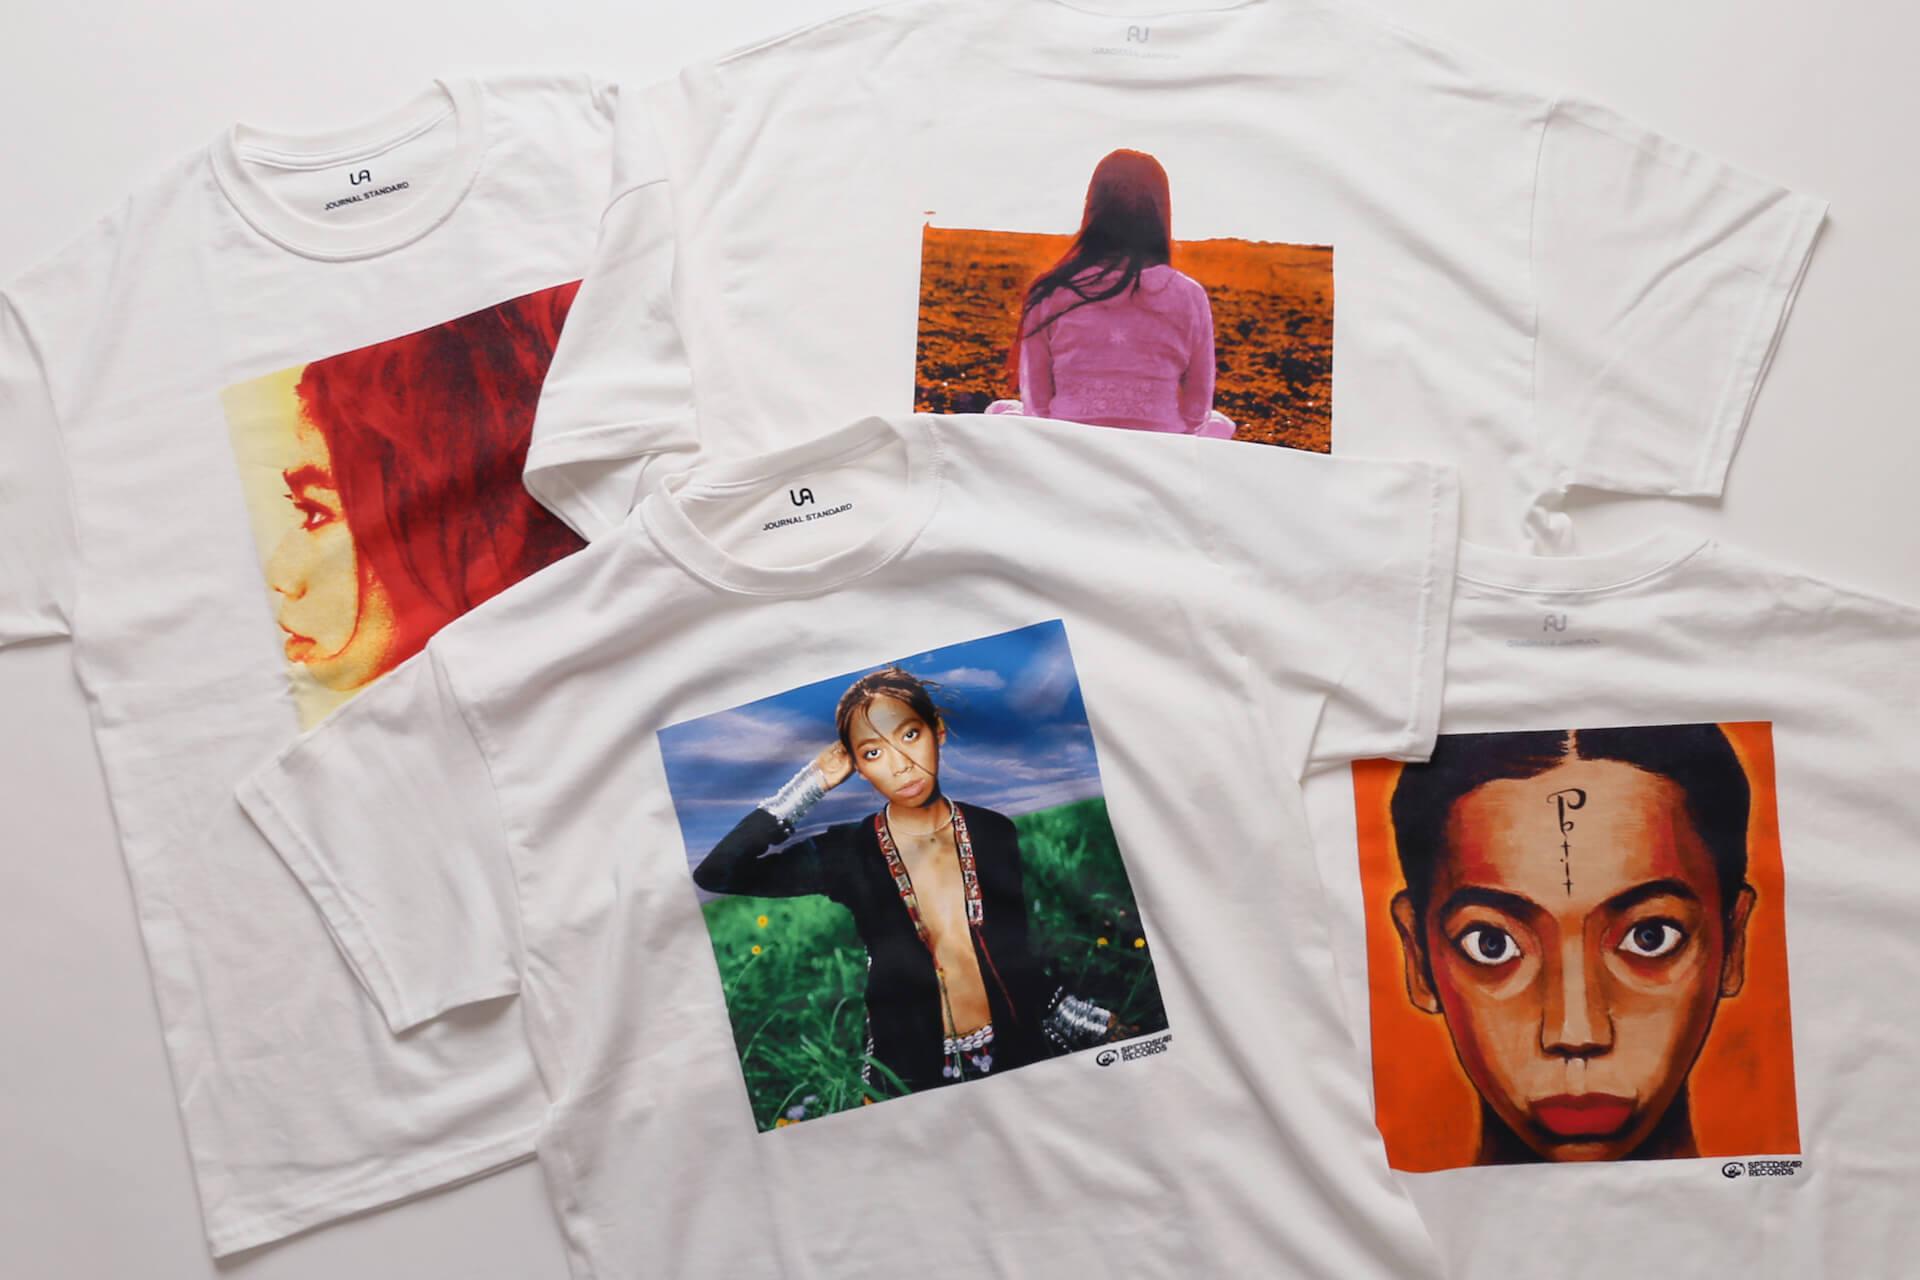 UA × Journal StandardのコラボTシャツが6月25日より店舗販売開始|美衣がモデルを務めるビジュアルも公開に life_fashion210611-ua-journalstandard